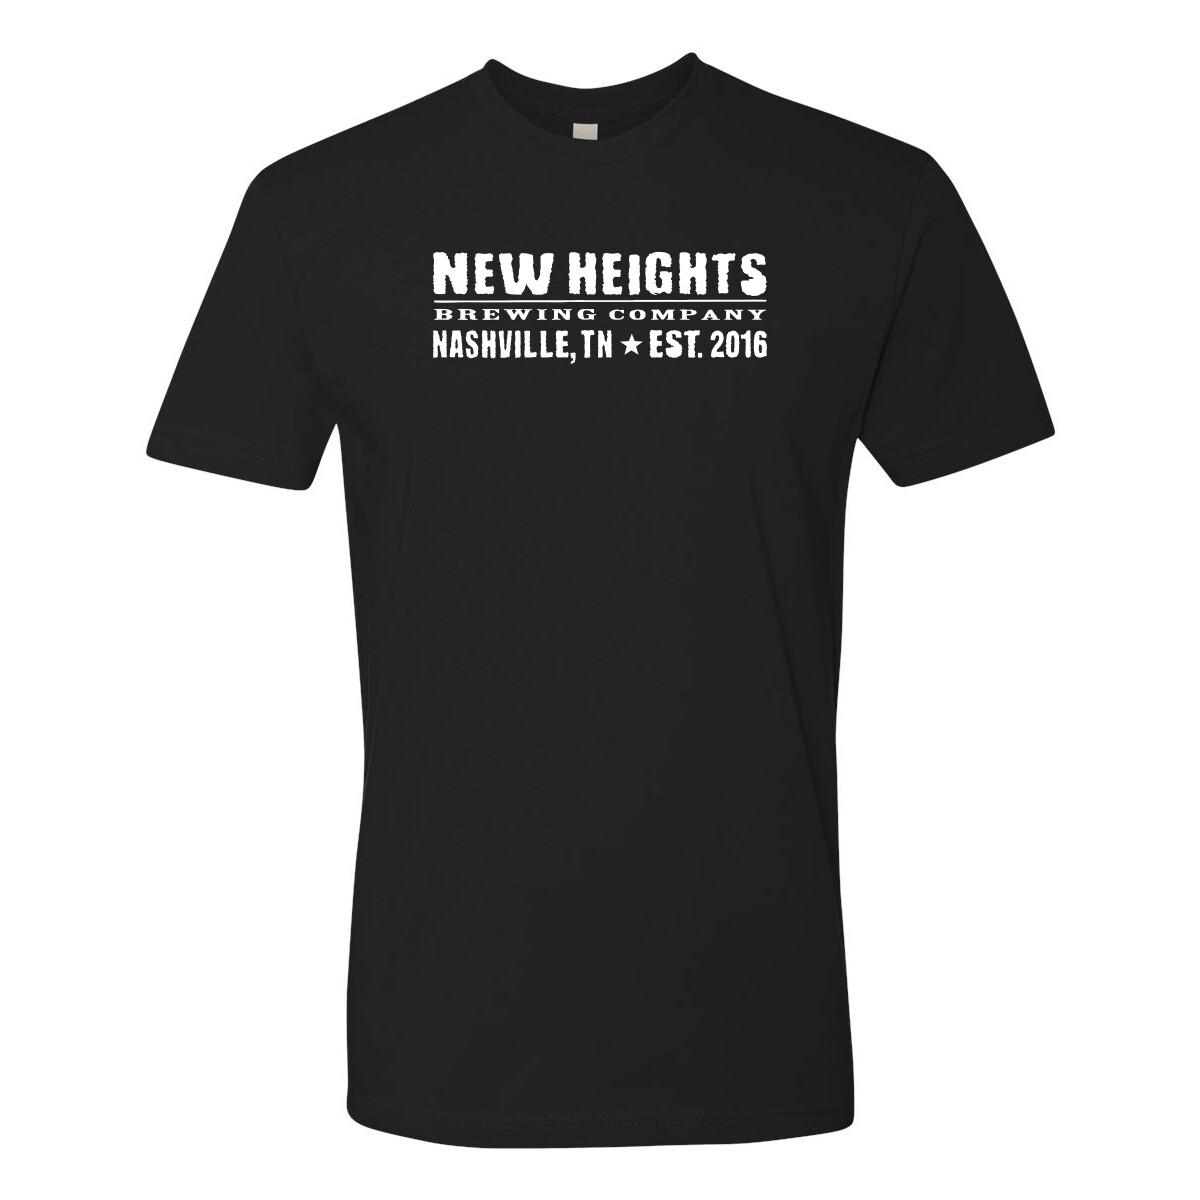 Next Level - NHB Logo T In Black